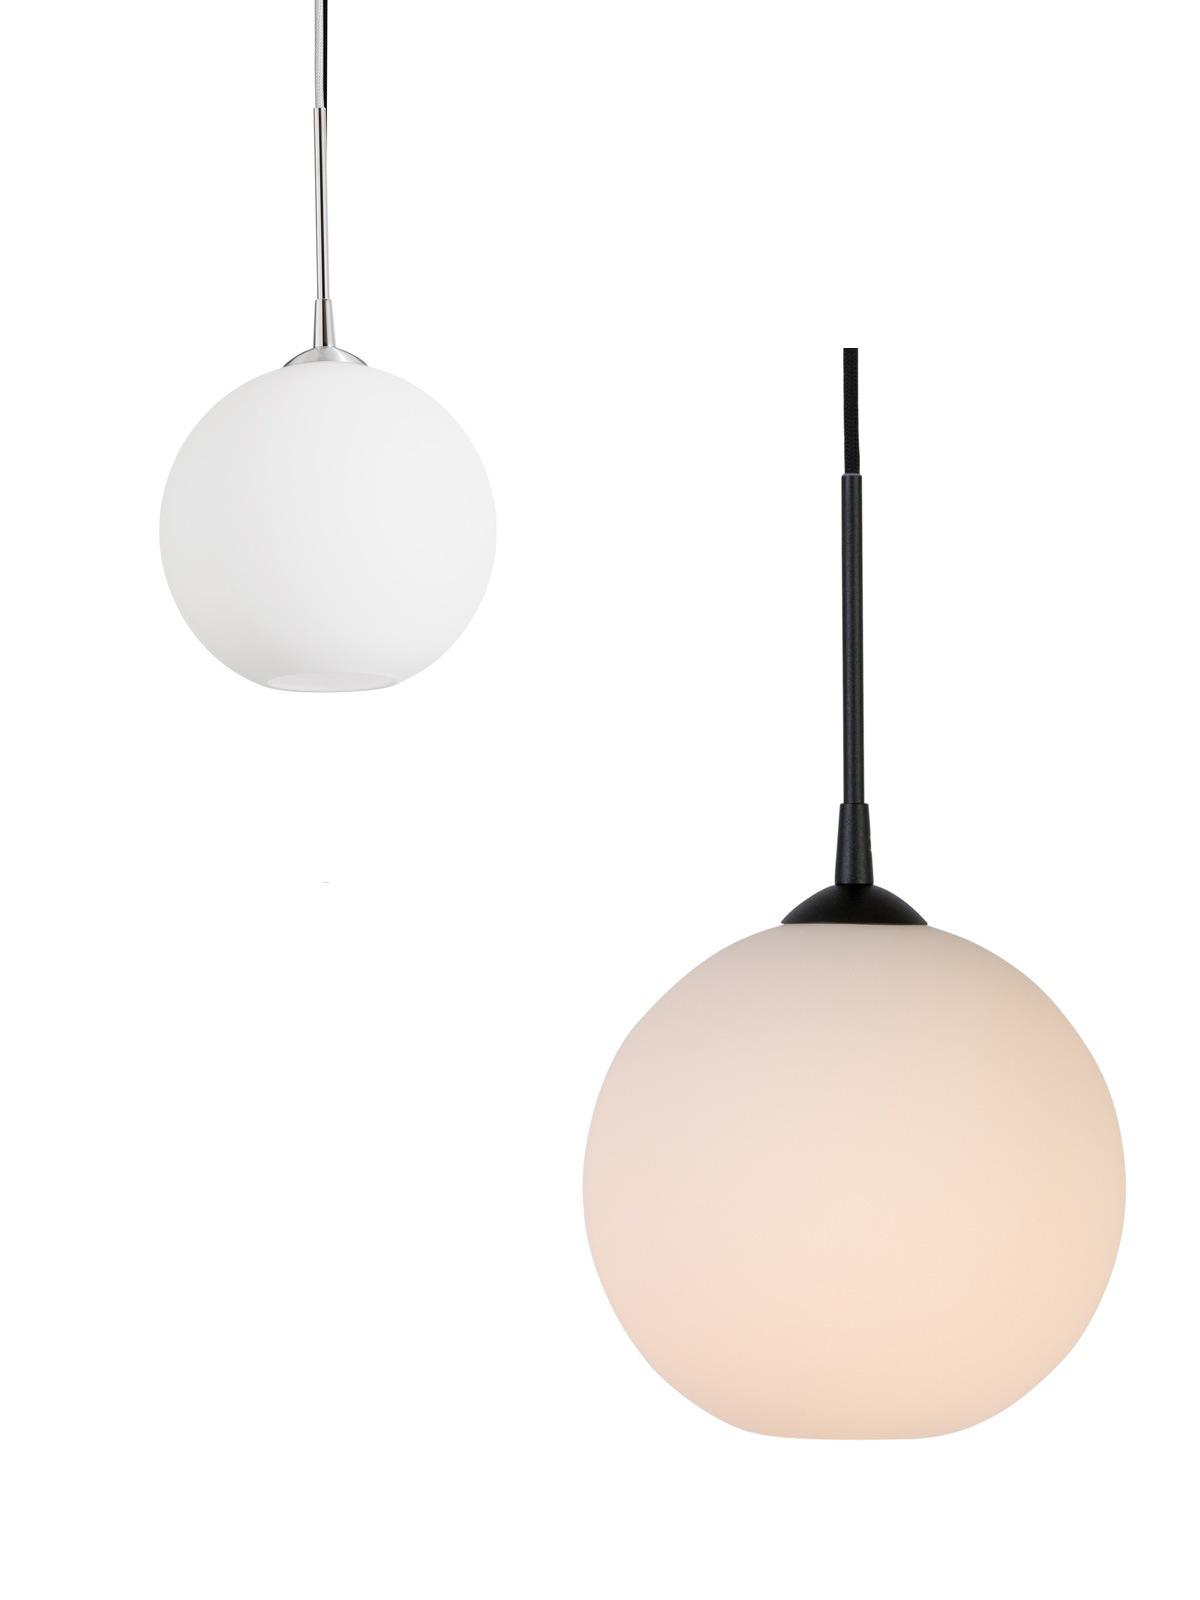 Capo Belid Glas Leuchte Milchglas Opalglas Belid DesignOrt Berlin Onlineshop